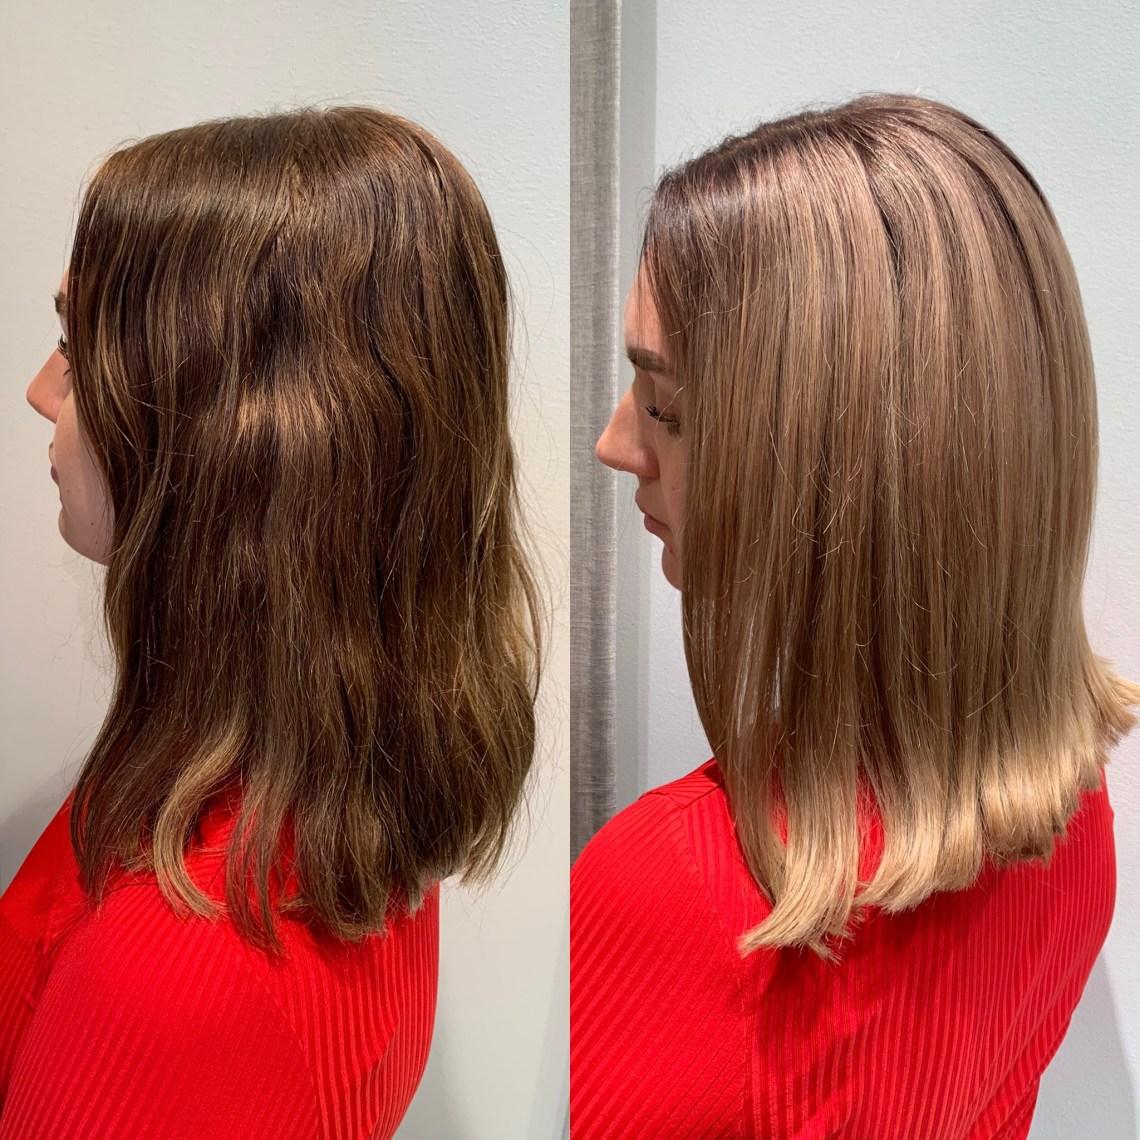 mörkblond hårfärg på brunt hår